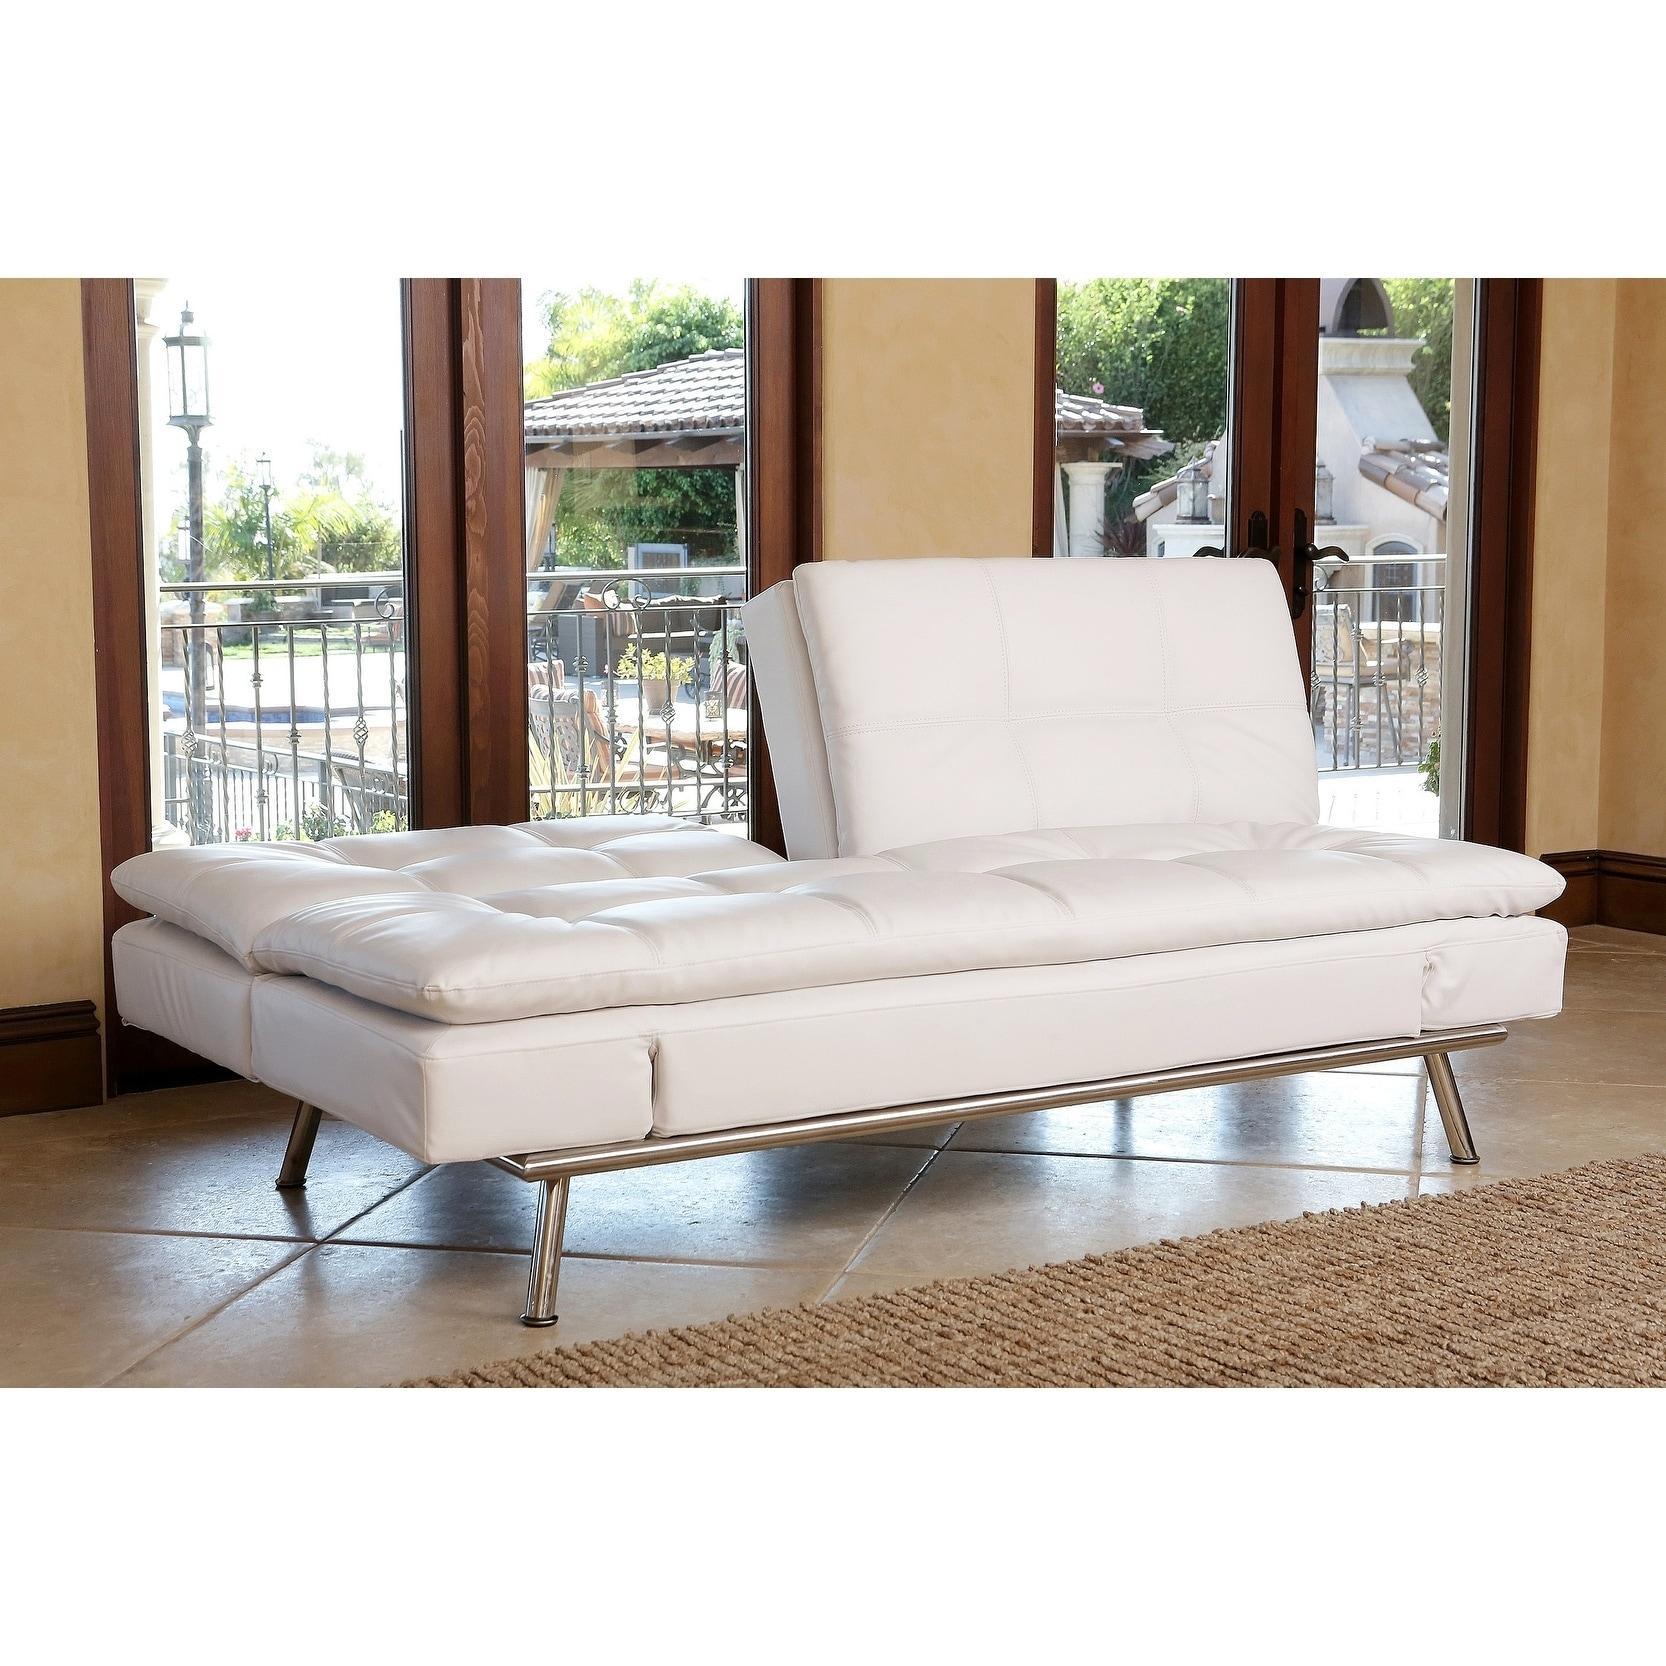 Fantastic Abbyson Marquee White Convertible Sofa Bralicious Painted Fabric Chair Ideas Braliciousco